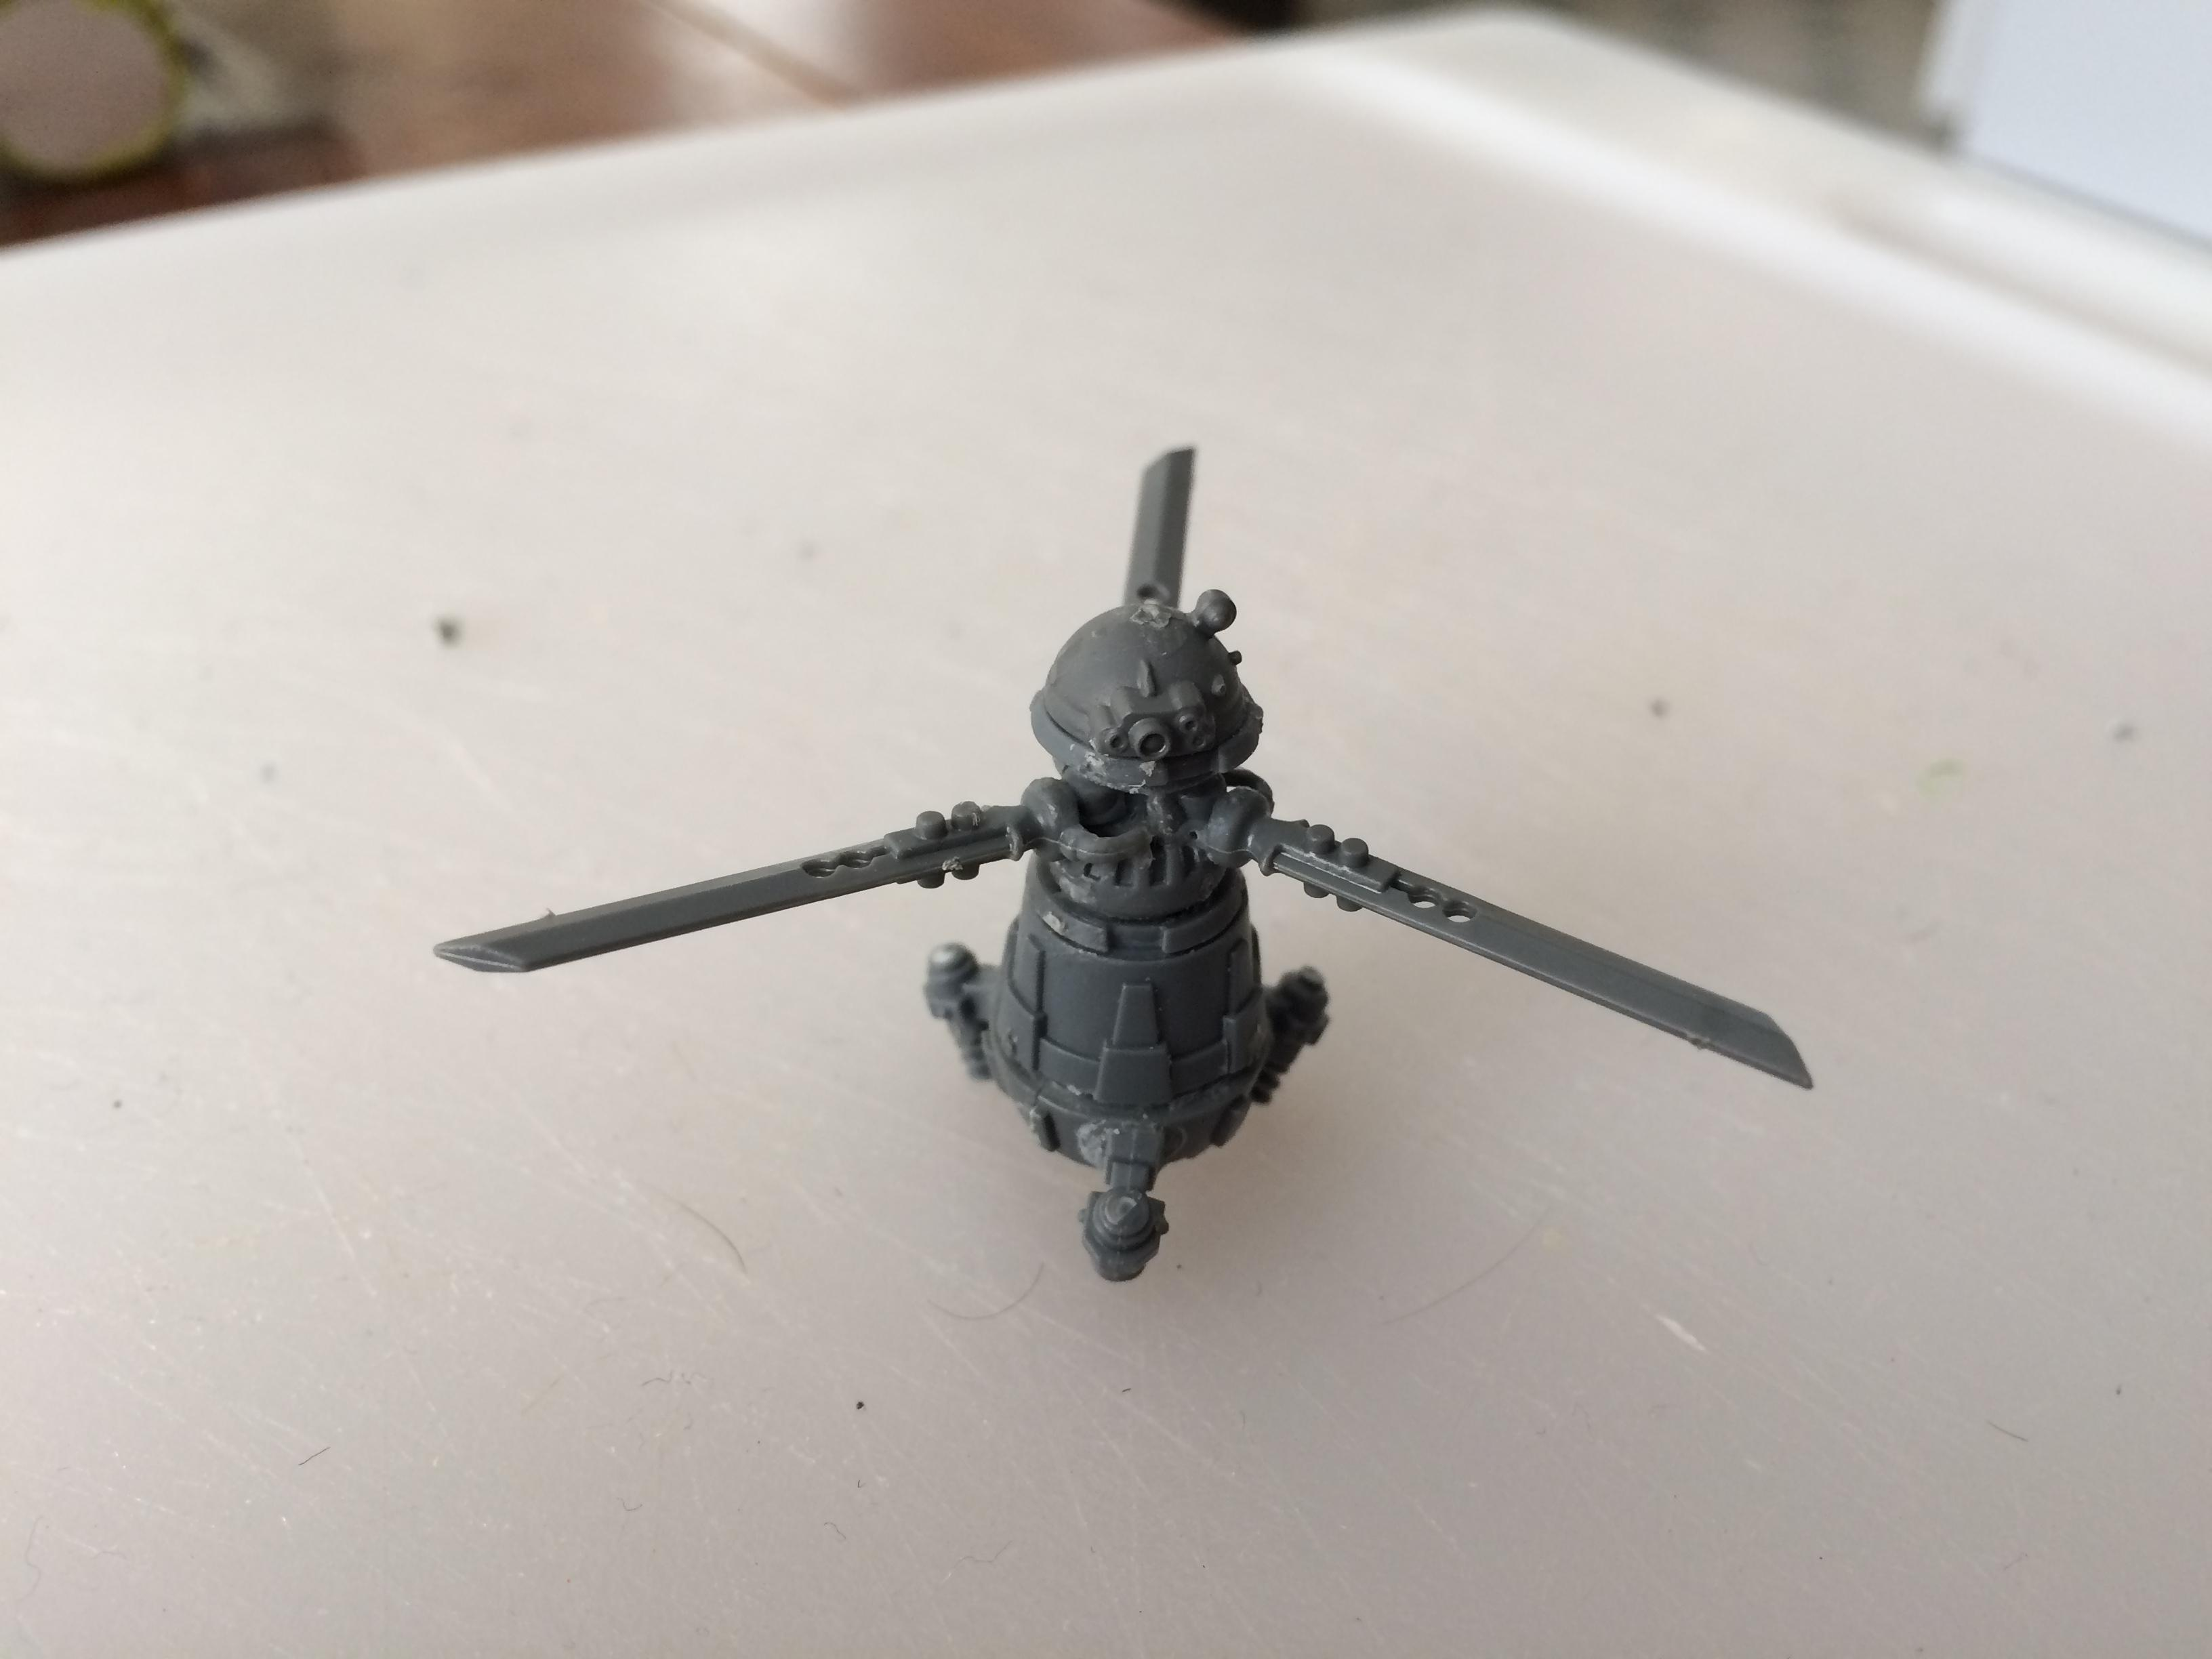 Drone, Kitbash, Mct-nissan Roto Drone, Roto Drone, Shadowrun